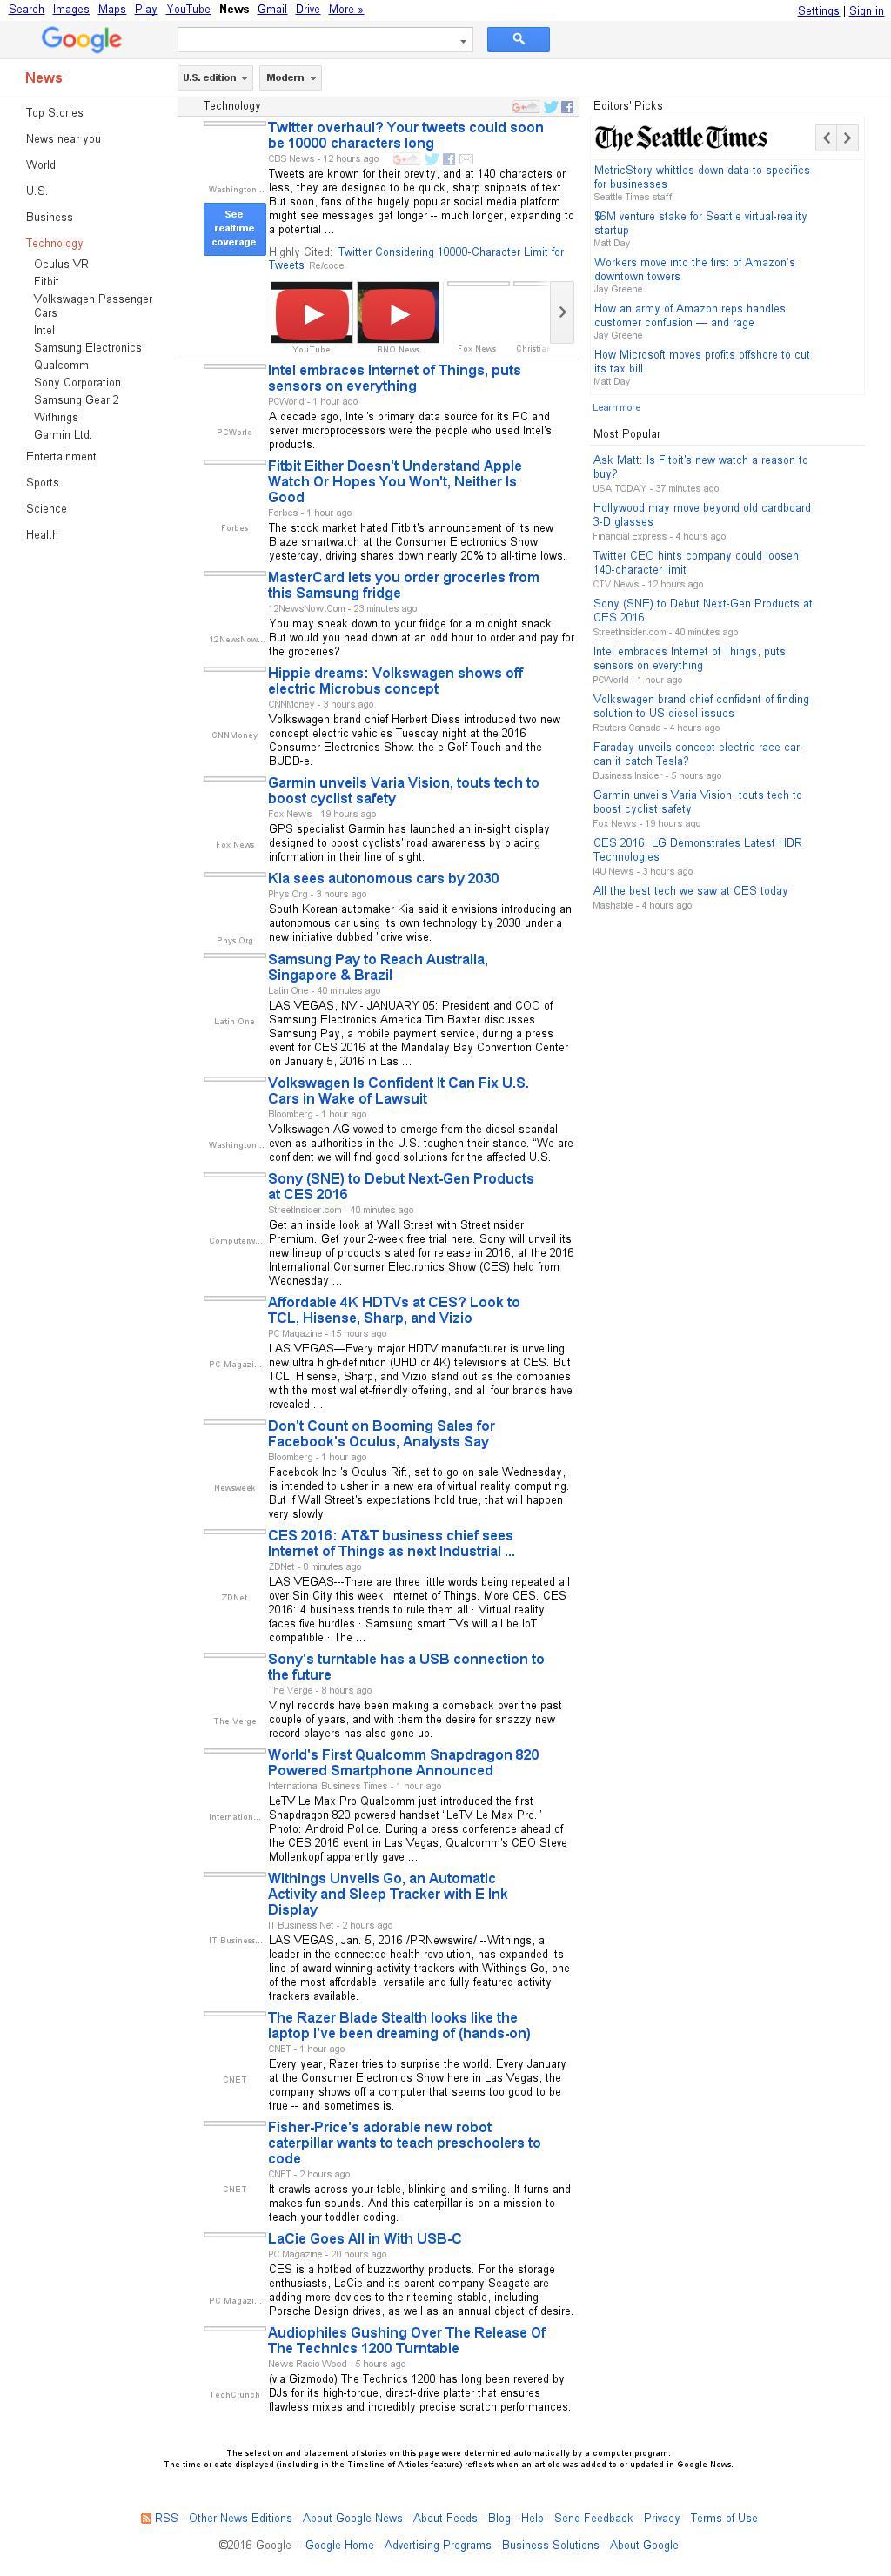 Google News: Technology at Wednesday Jan. 6, 2016, 12:09 p.m. UTC